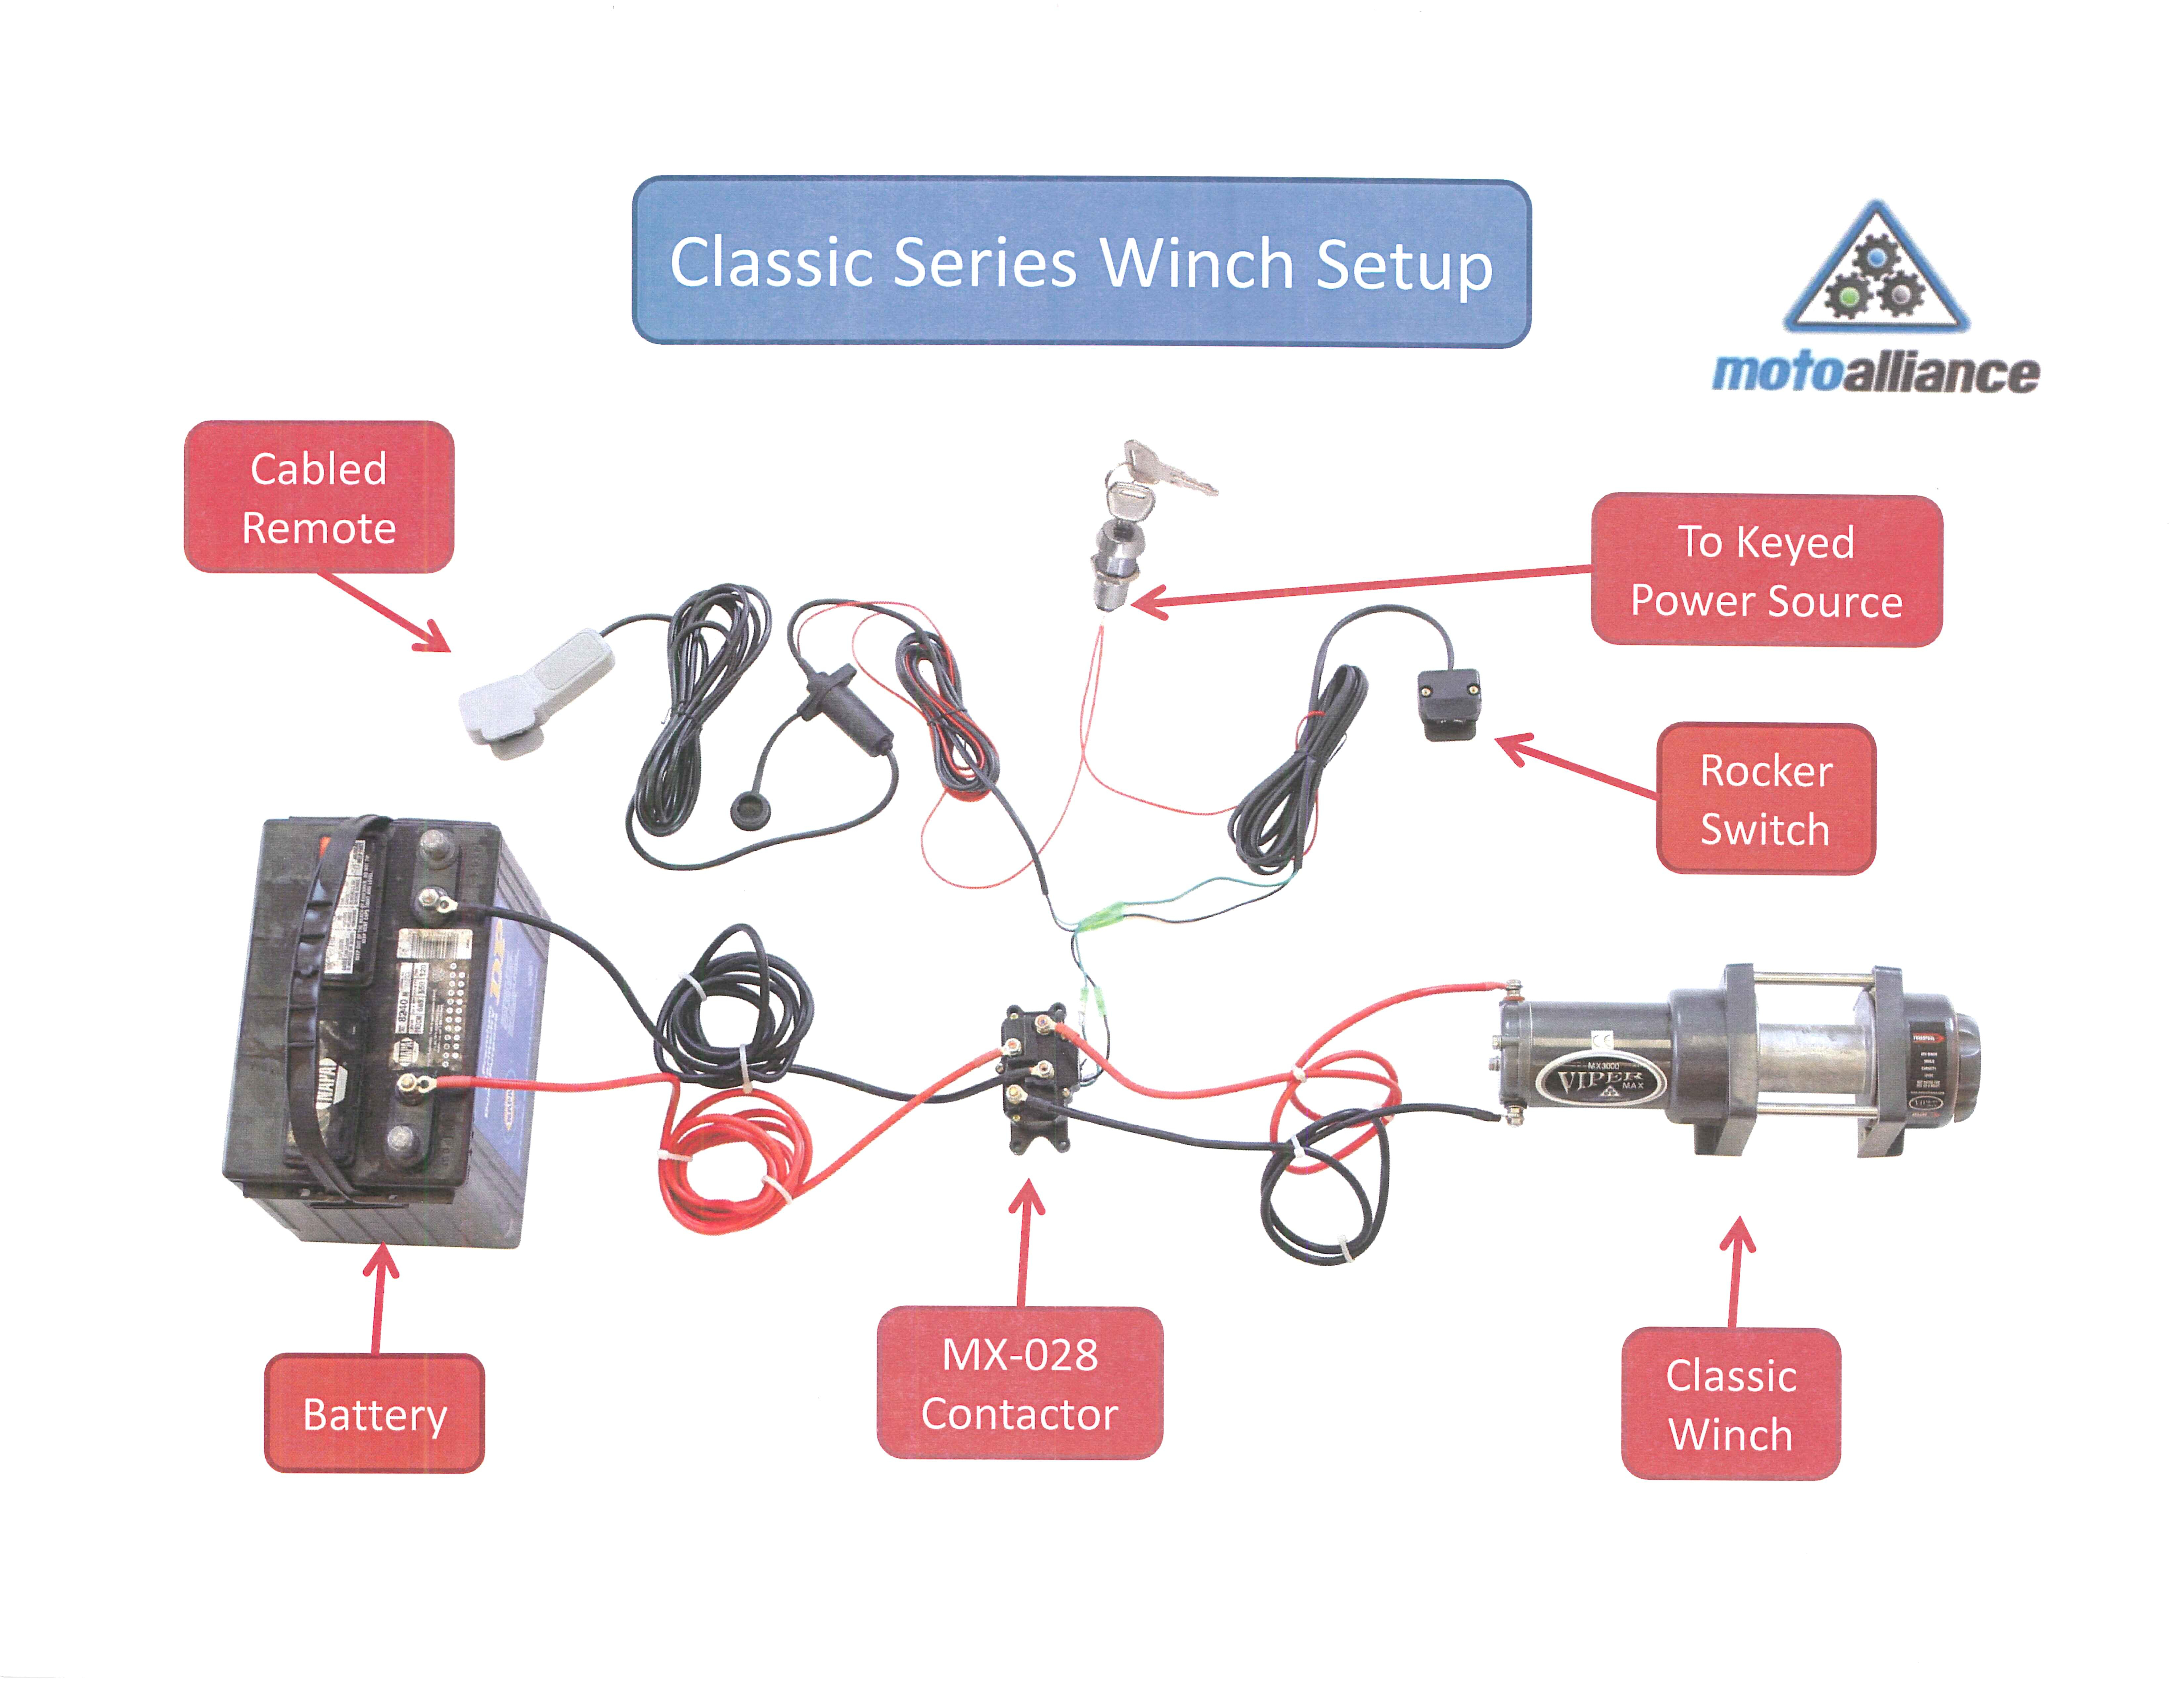 Diagram T Max 4500 Winch Wiring Diagram Full Version Hd Quality Wiring Diagram Diagrammcnewm Famigliearoma It